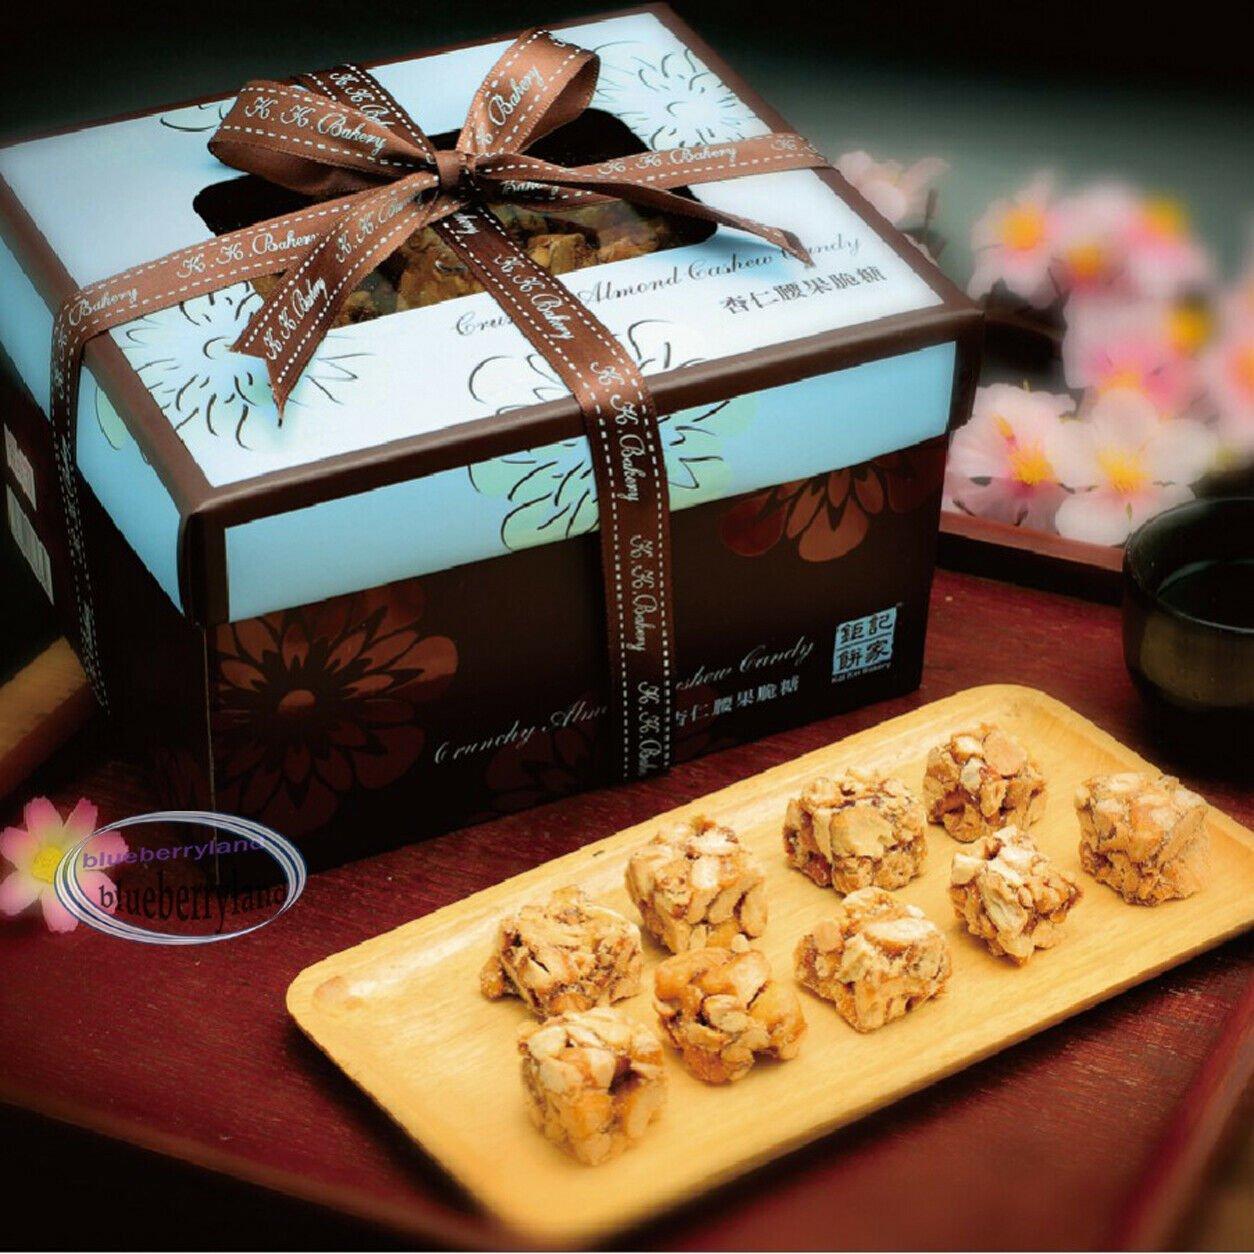 Macau Koi Kei Bakery Crunchy Almond Cashew Candy sweet candies snacks